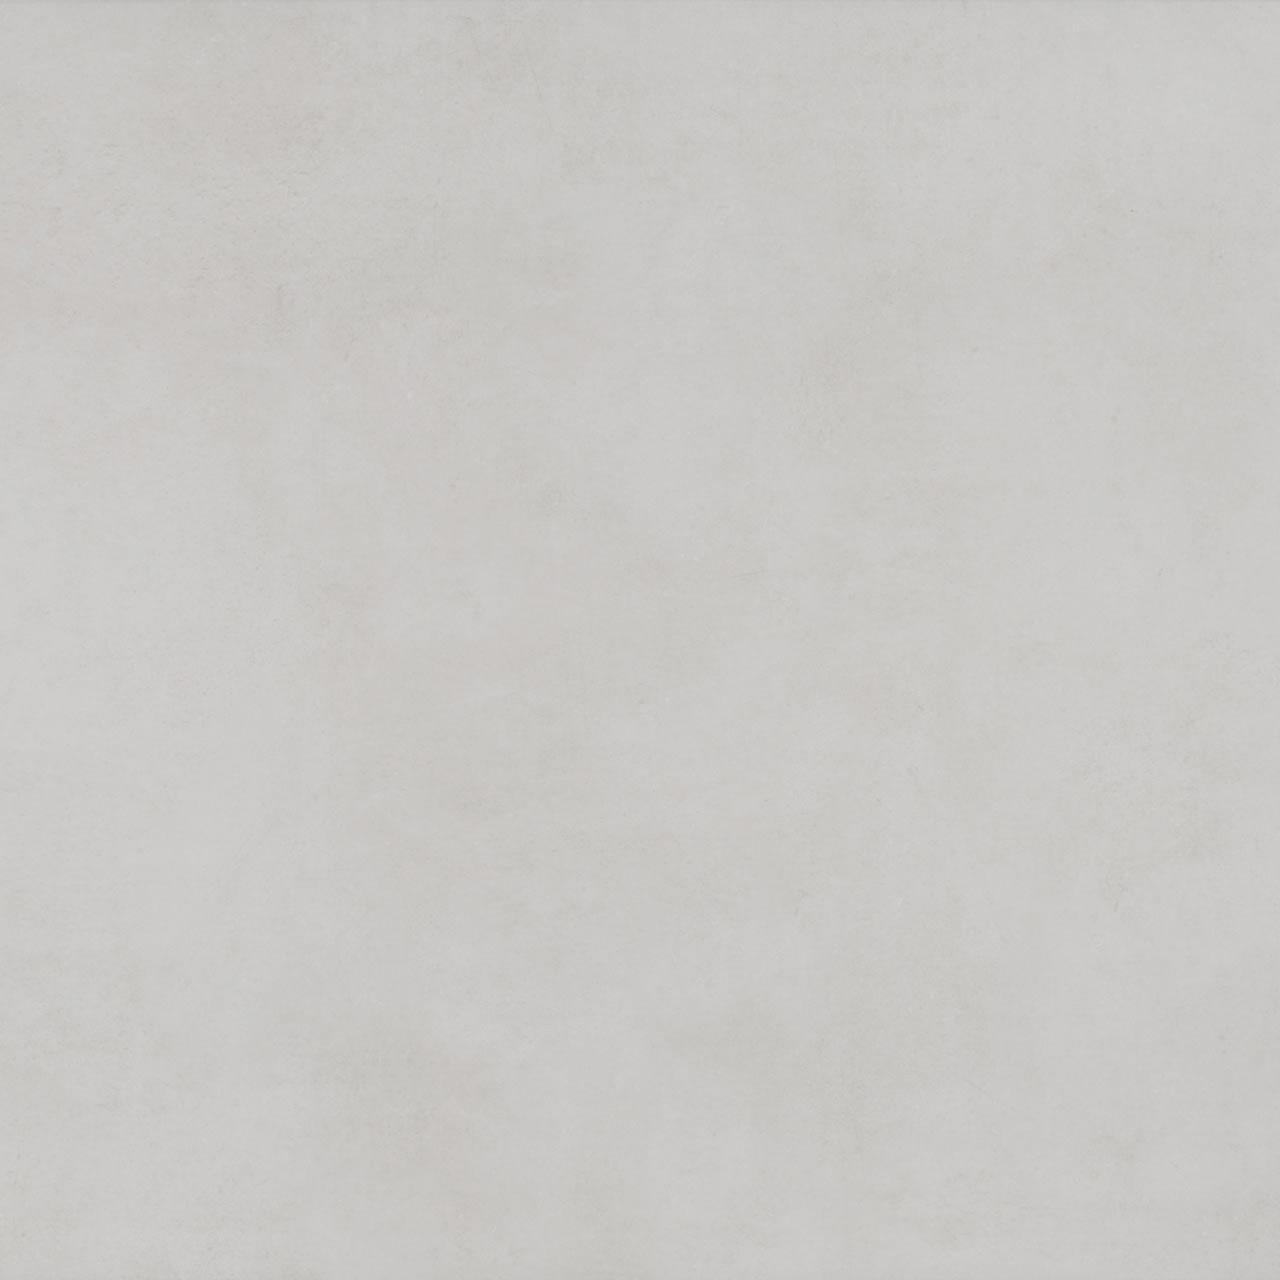 Limpia Yuna Branco Ac Ev 60×60